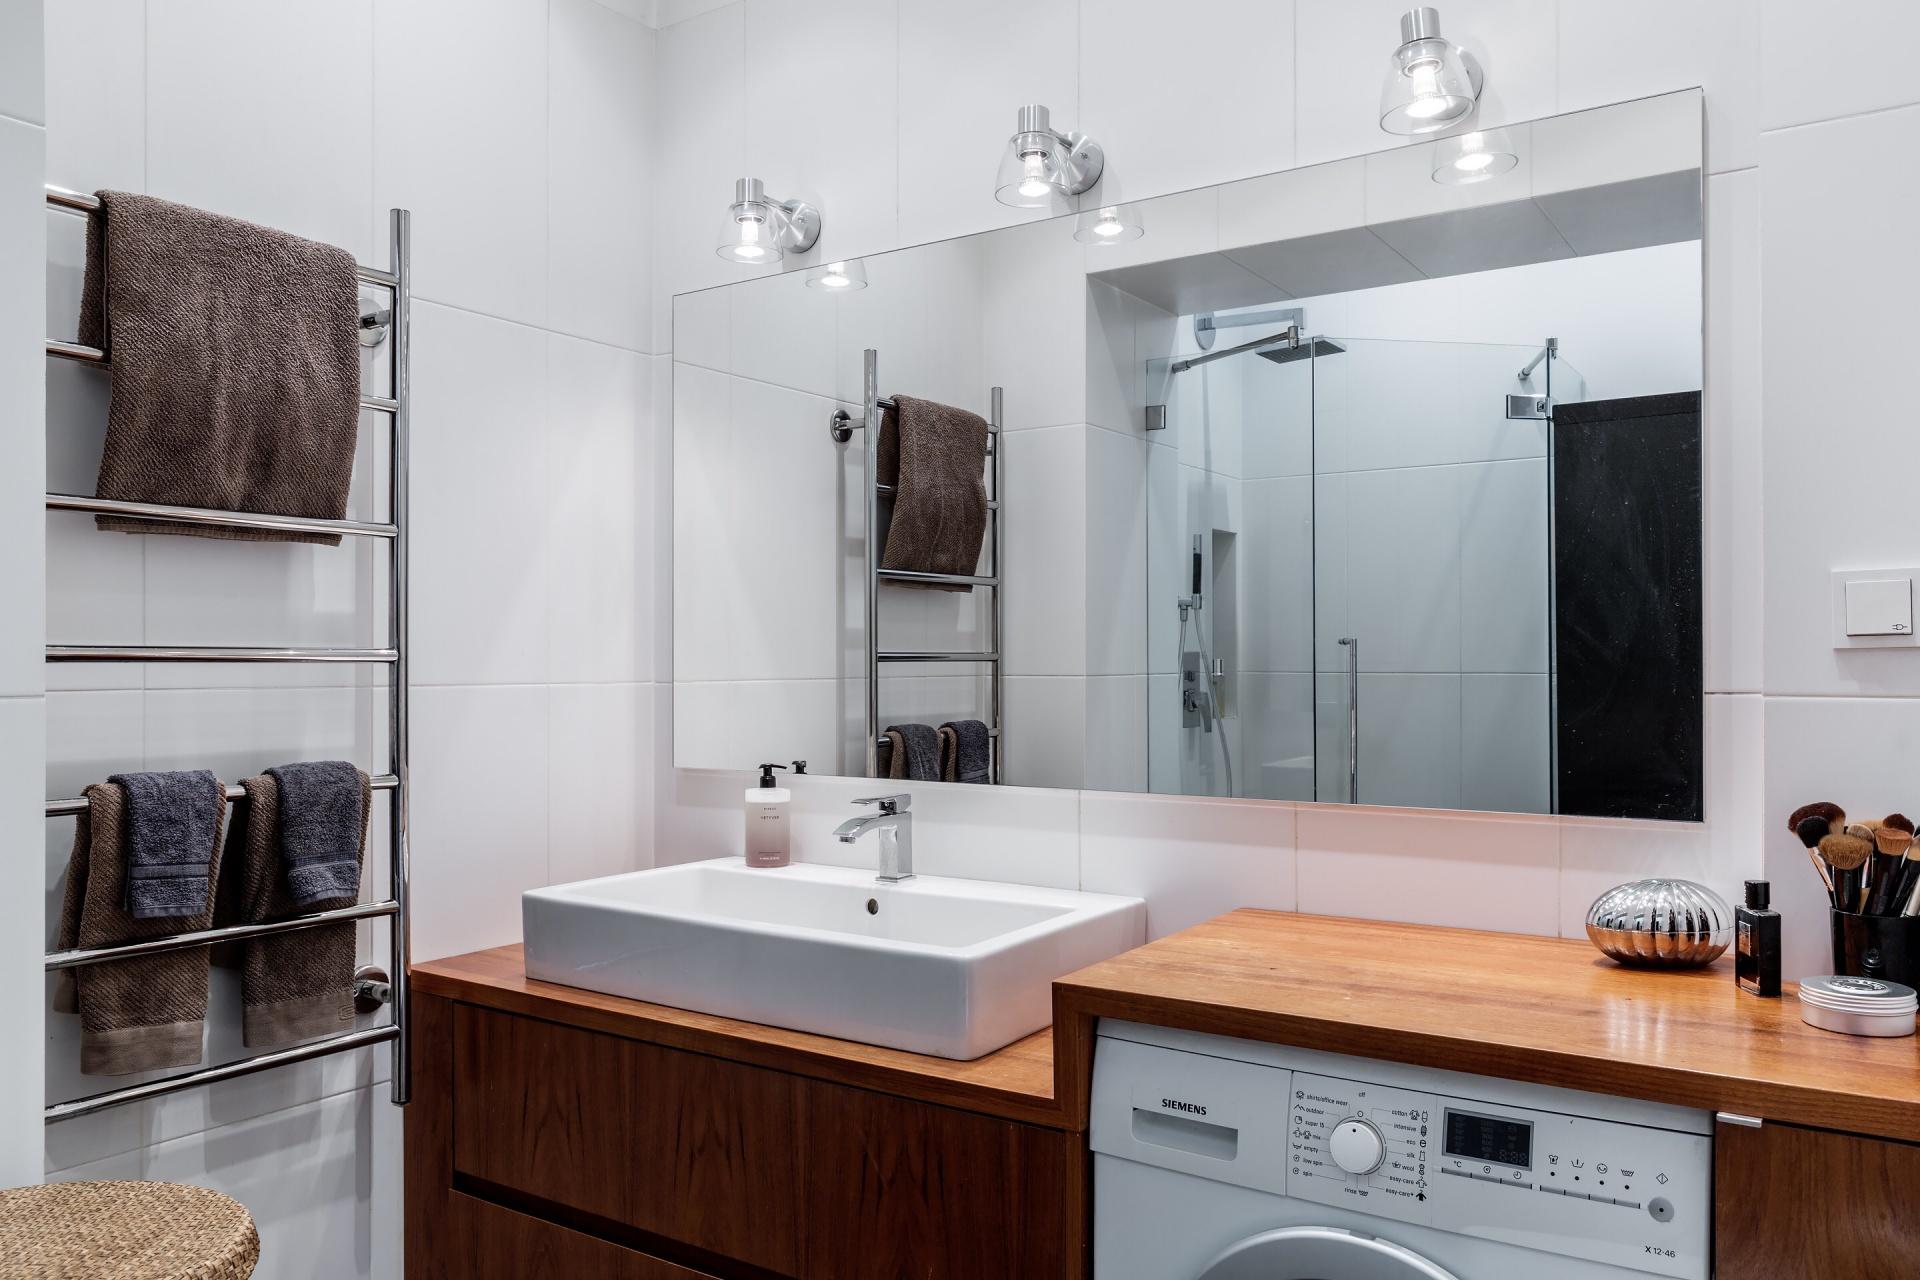 ванная комната накладная раковина зеркало подсветка стиральная машина полотенцесушитель